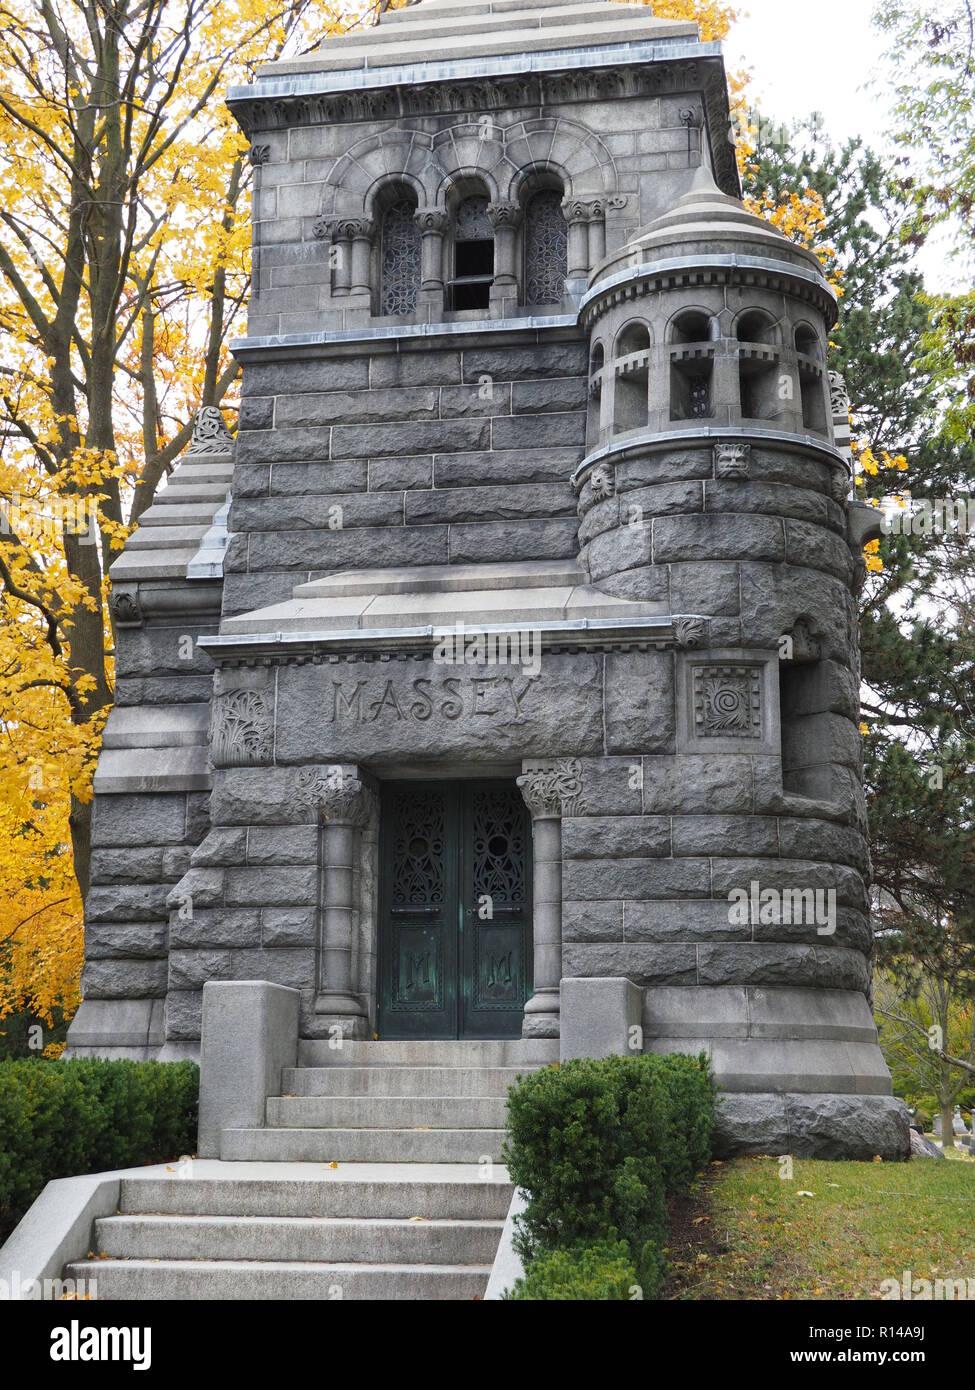 Massey Family Mausoleum, Mount Pleasant Cemetery in Toronto Stock Photo